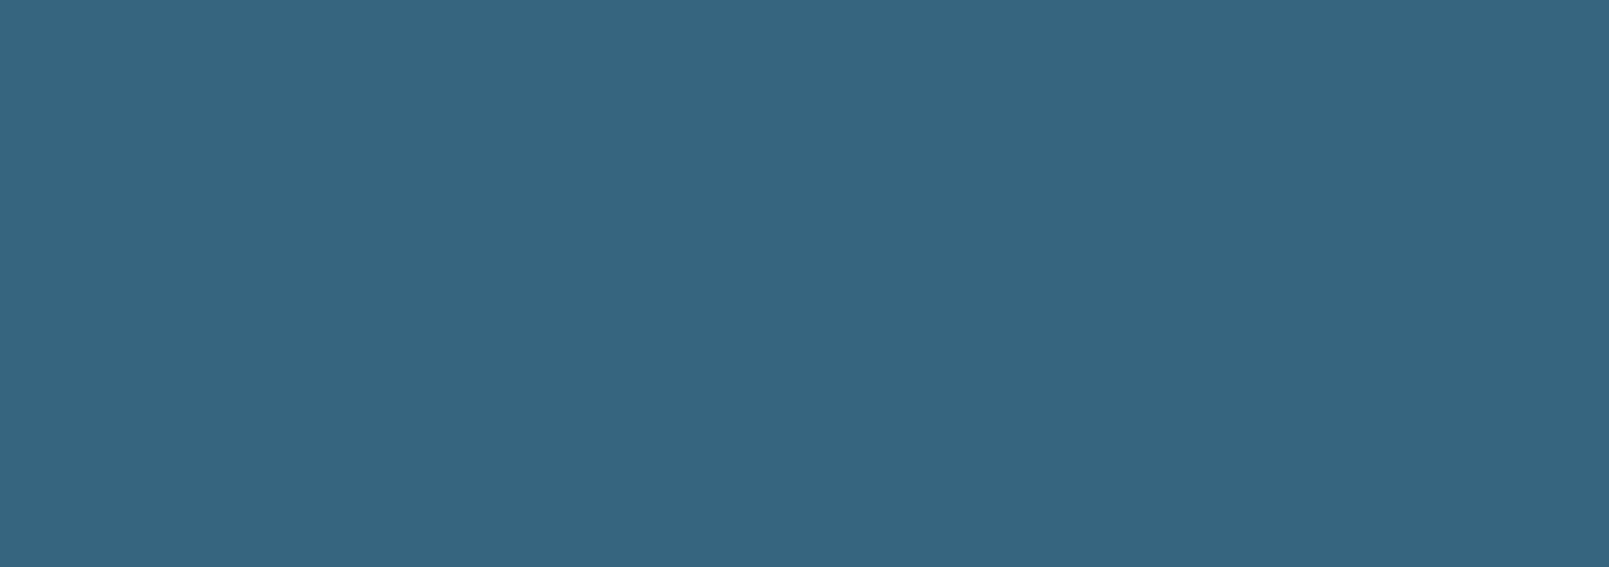 Ebbingehof Logo